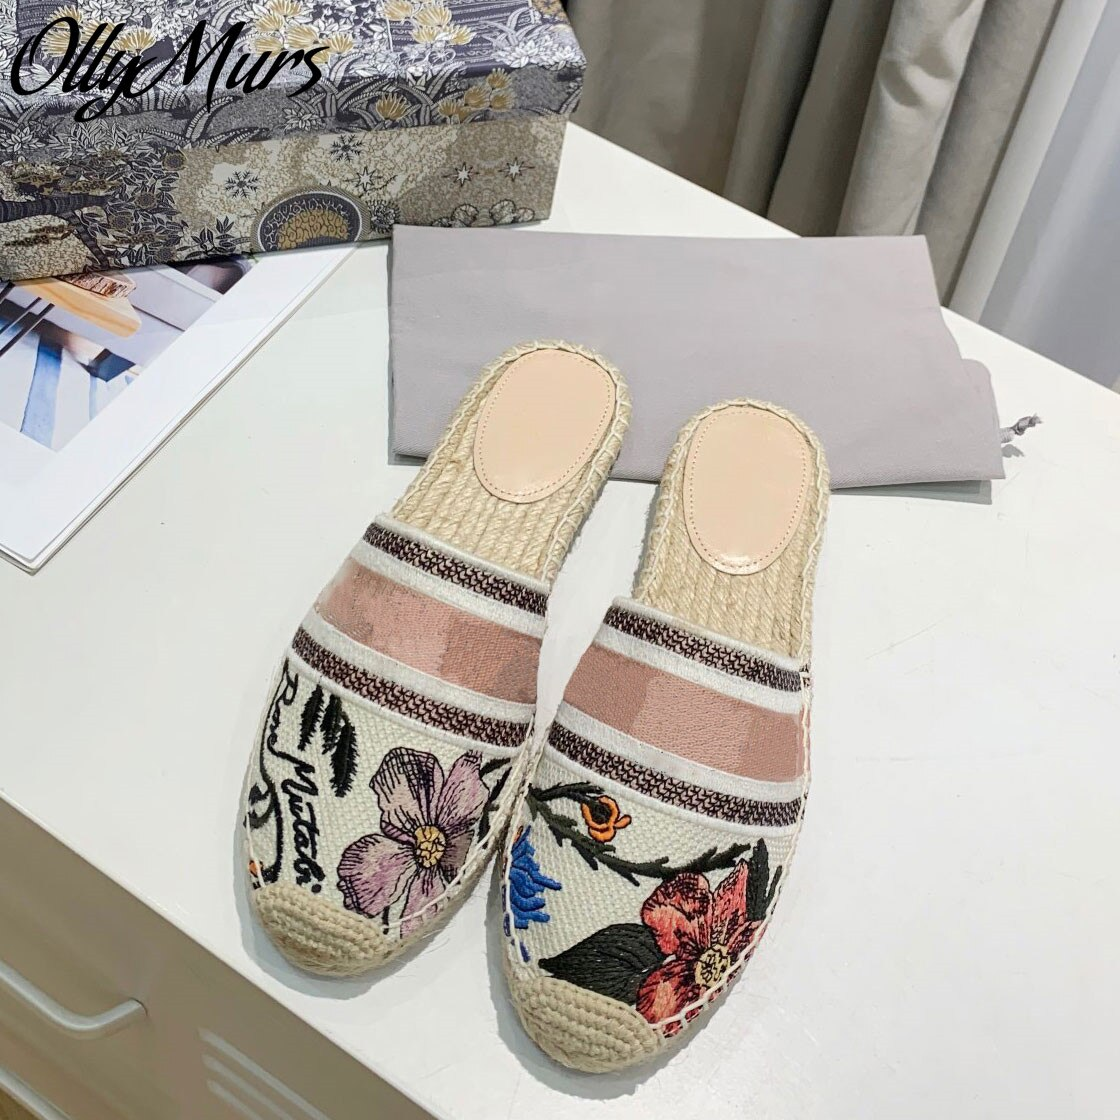 Ollymurs  Luxury Brand Slippers Women Fashion ladies Flats  female Flip Flops Slides Women  Mules sh